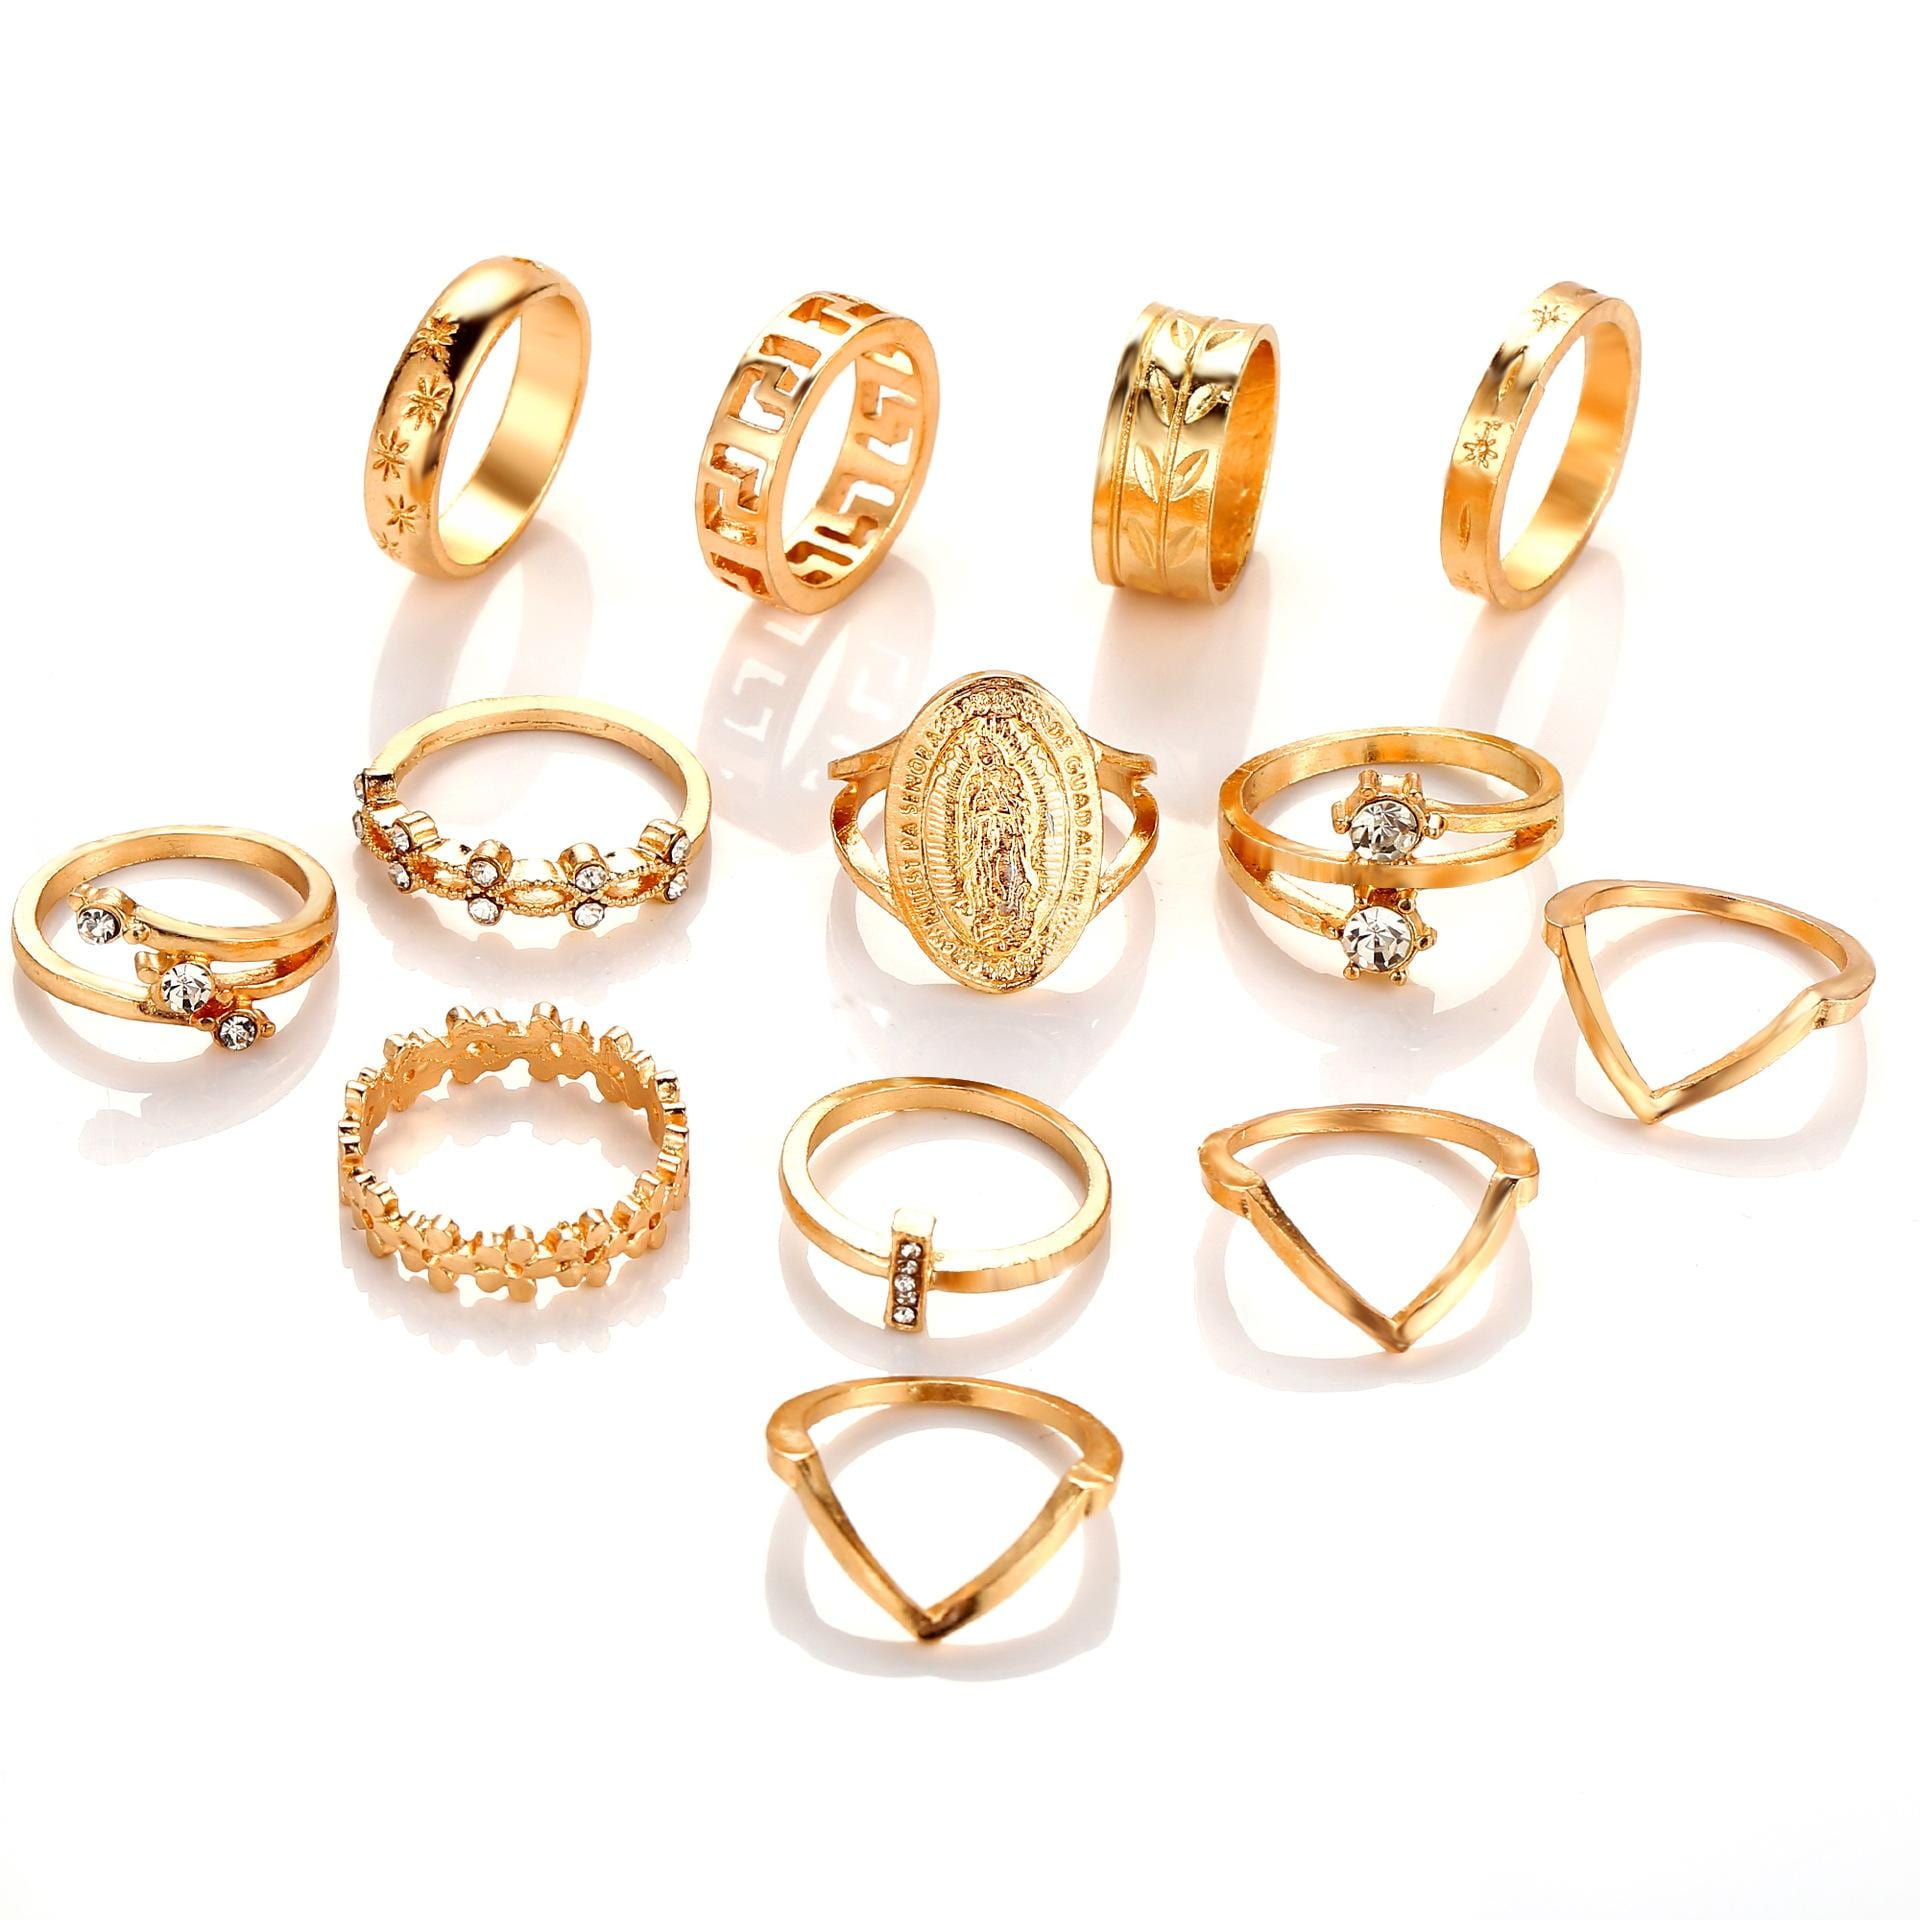 Creative Vintage English Letters Virgin Diamond Ring Set